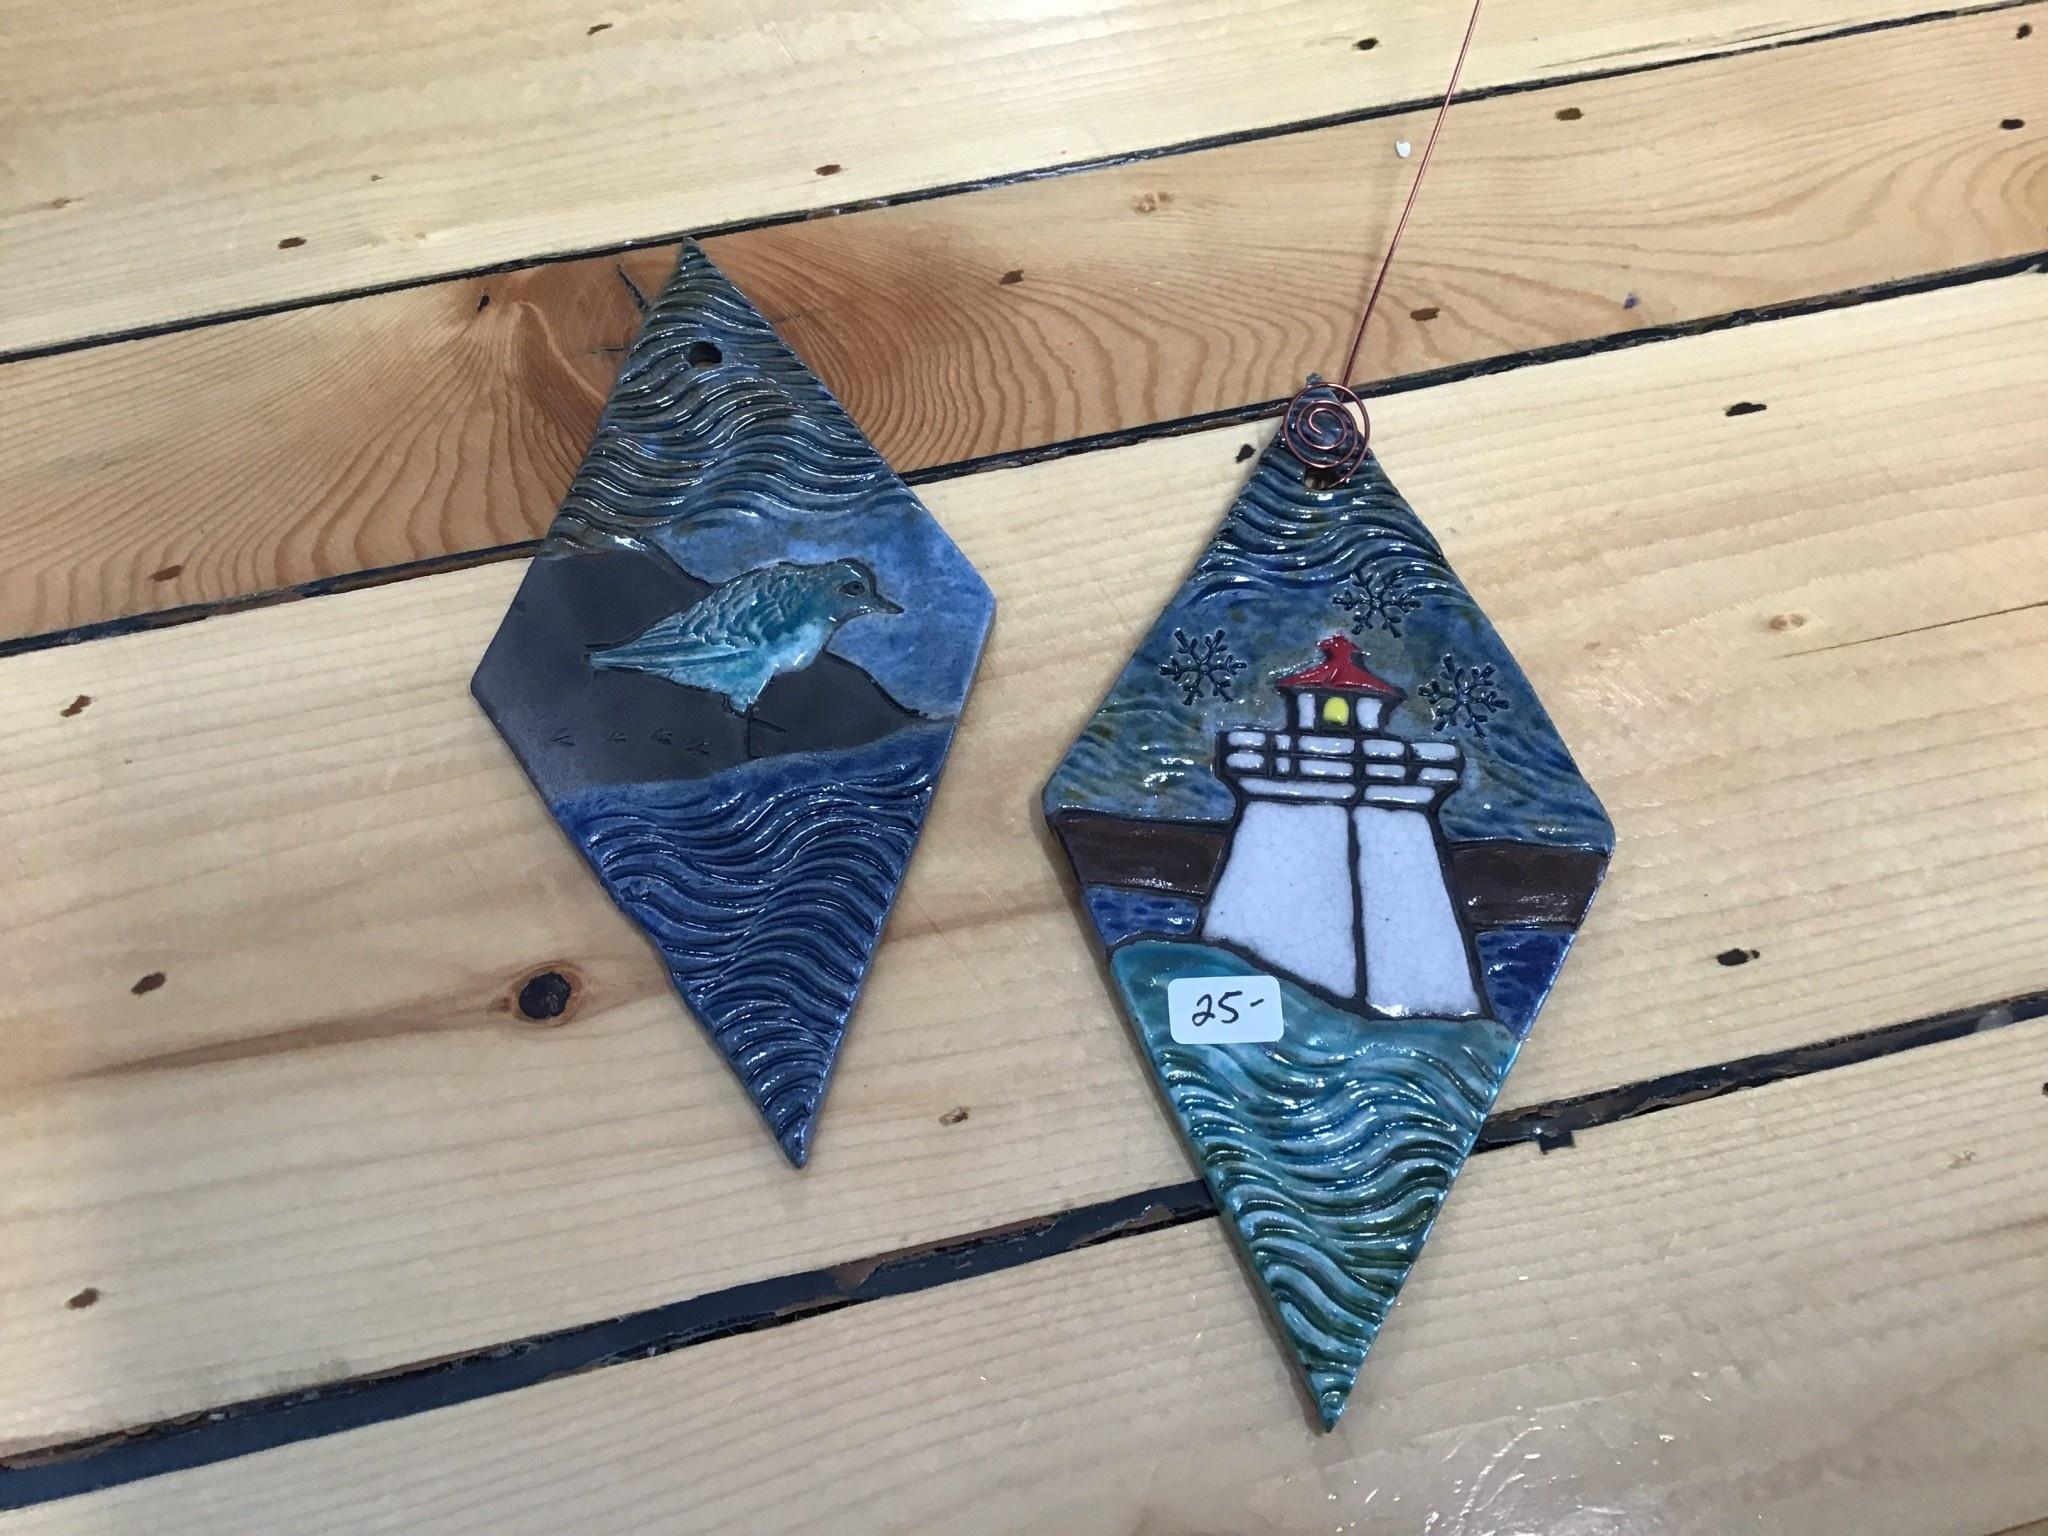 Tim Isaac Ornaments